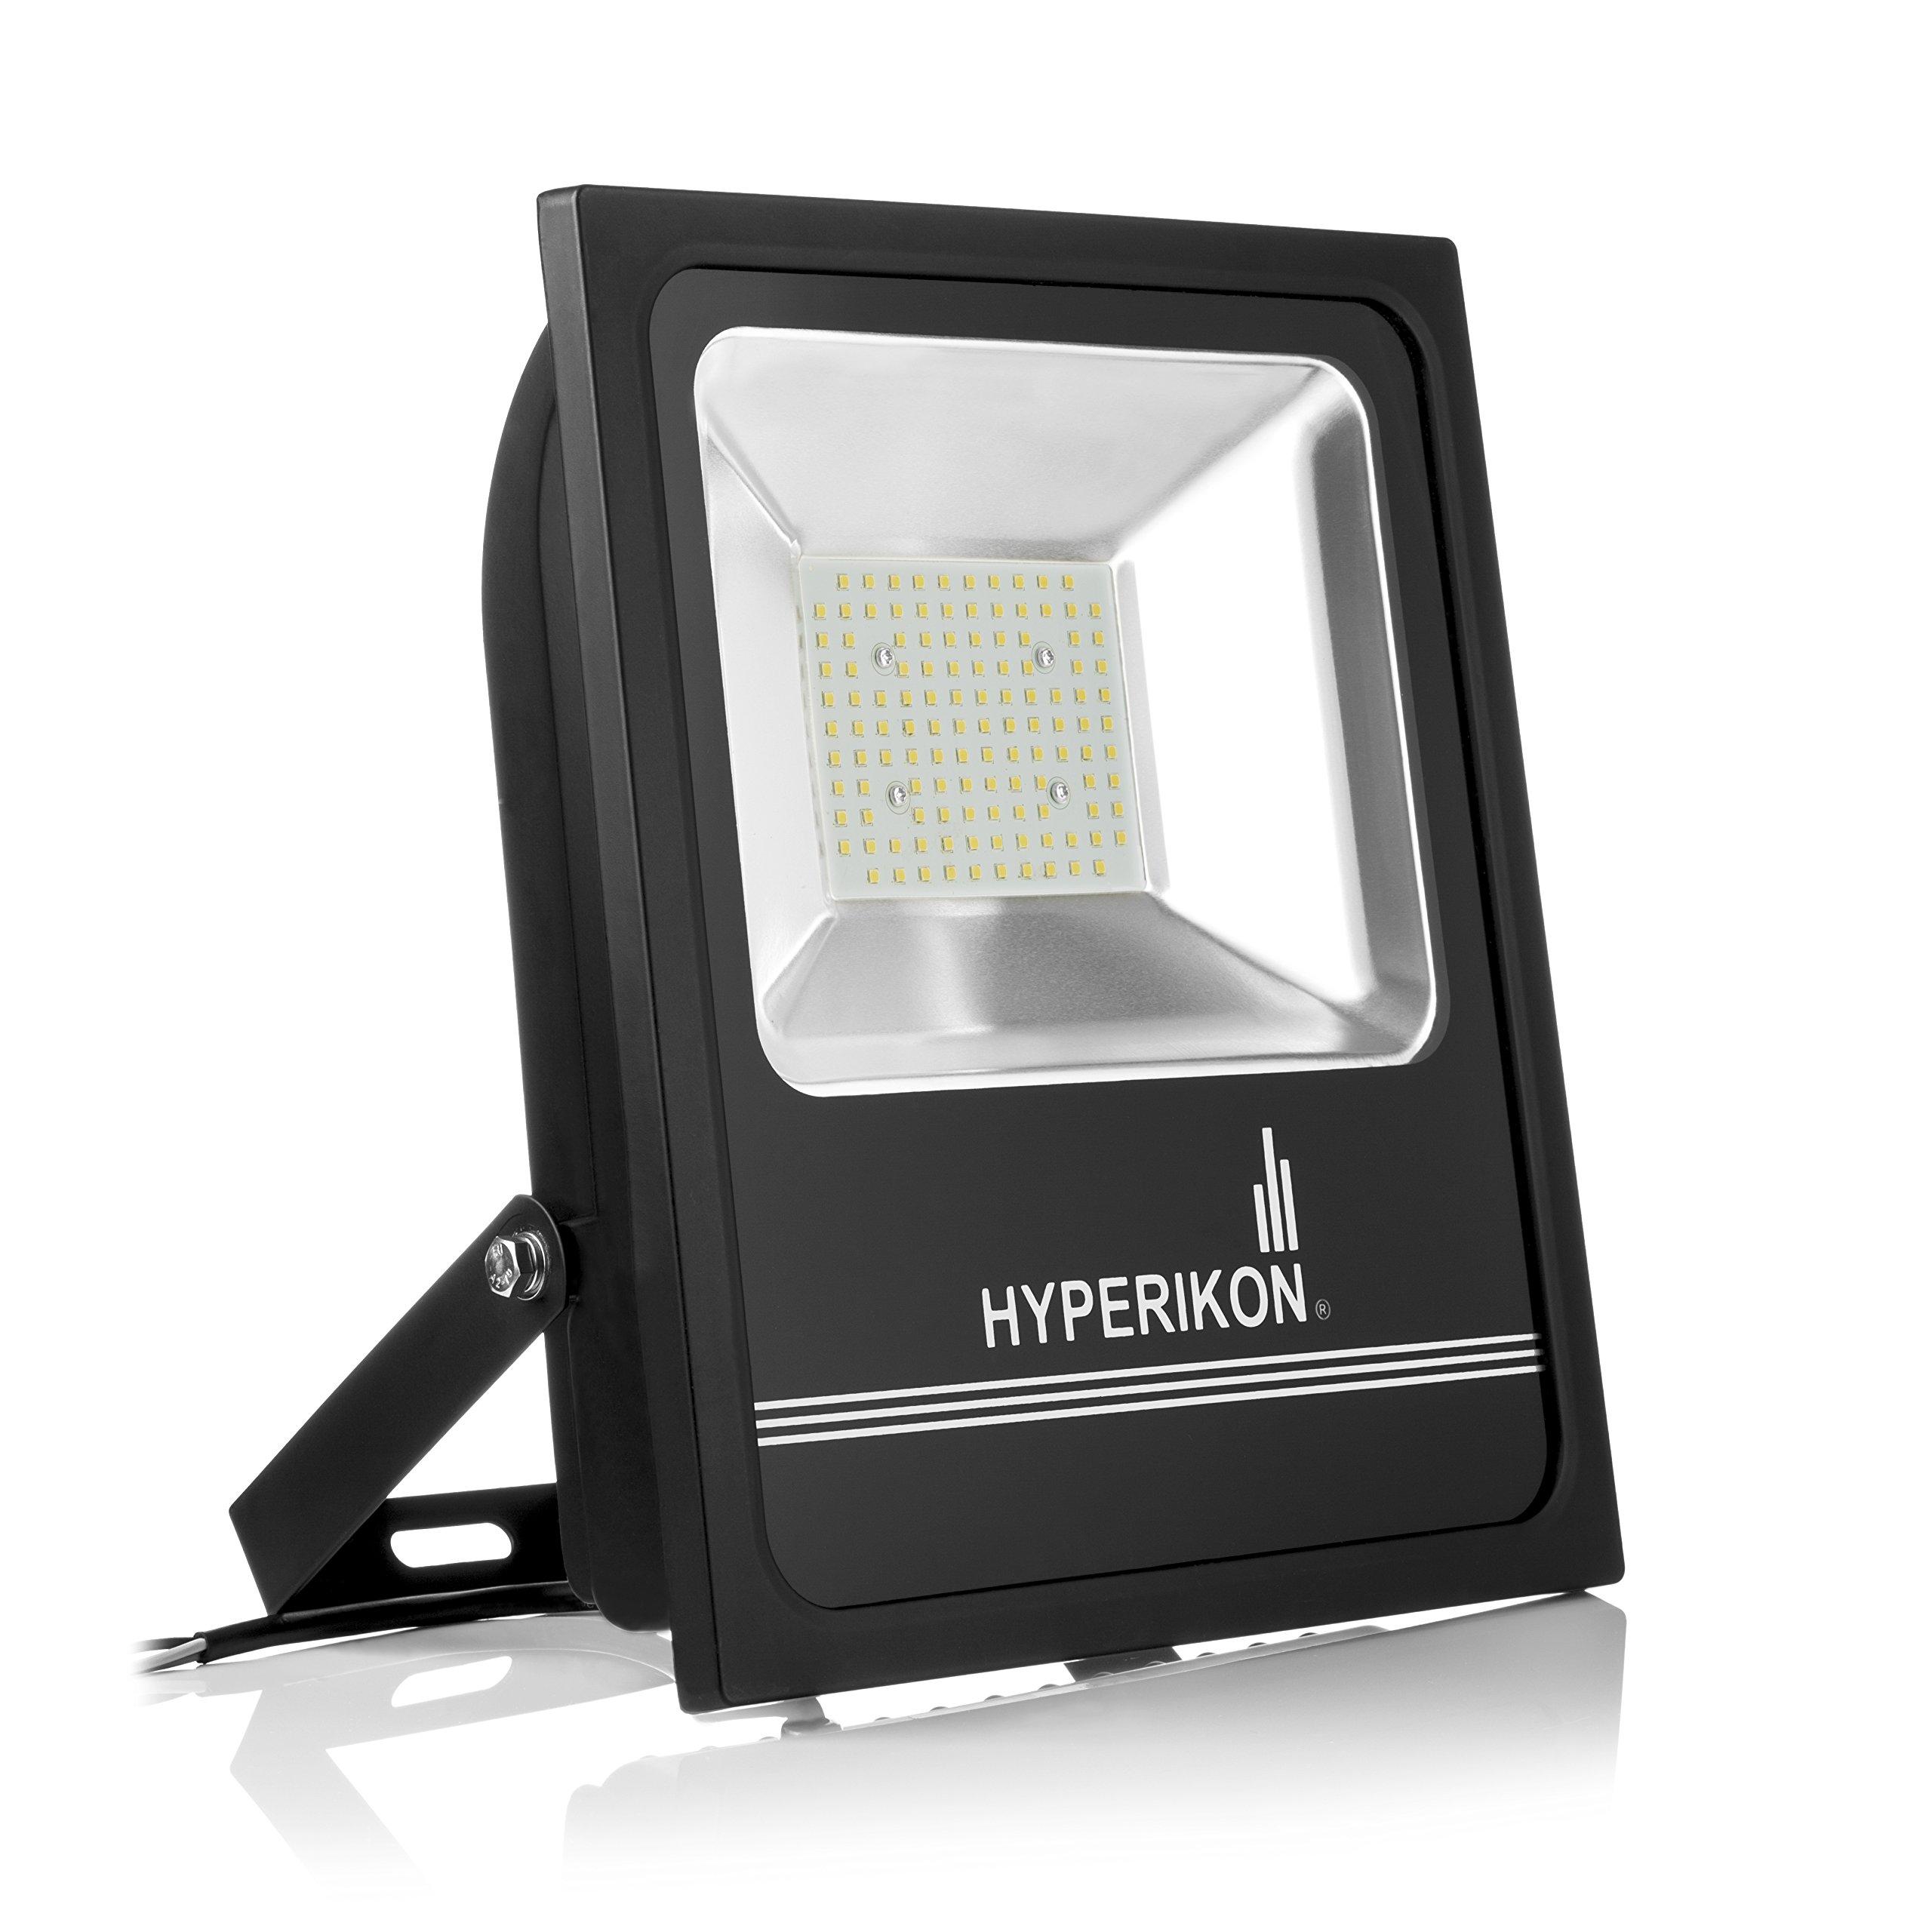 HyperSelect 100W LED Flood Light, (500 Watt Equivalent), 10000 lumen, 5000K Crystal White, Super Bright Outdoor LED Floodlight, UL, 100-277v, IP66 Waterproof